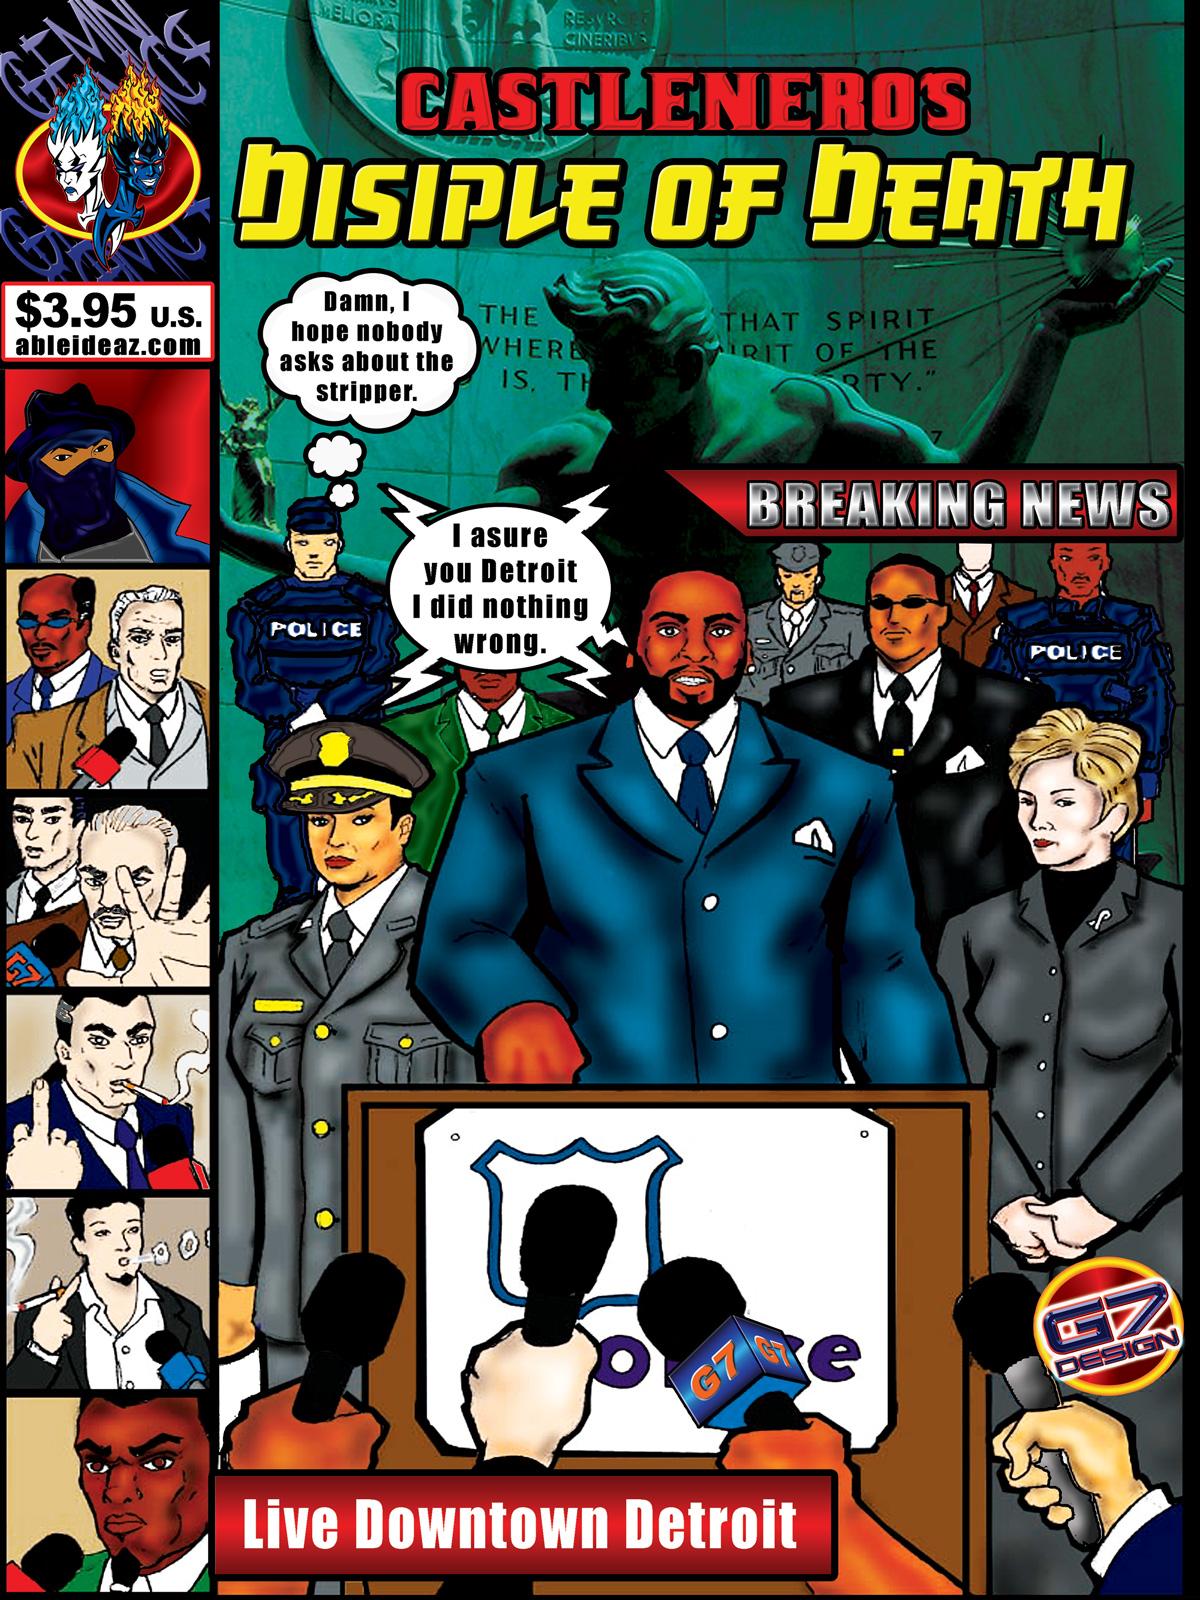 Disciple of Death #2